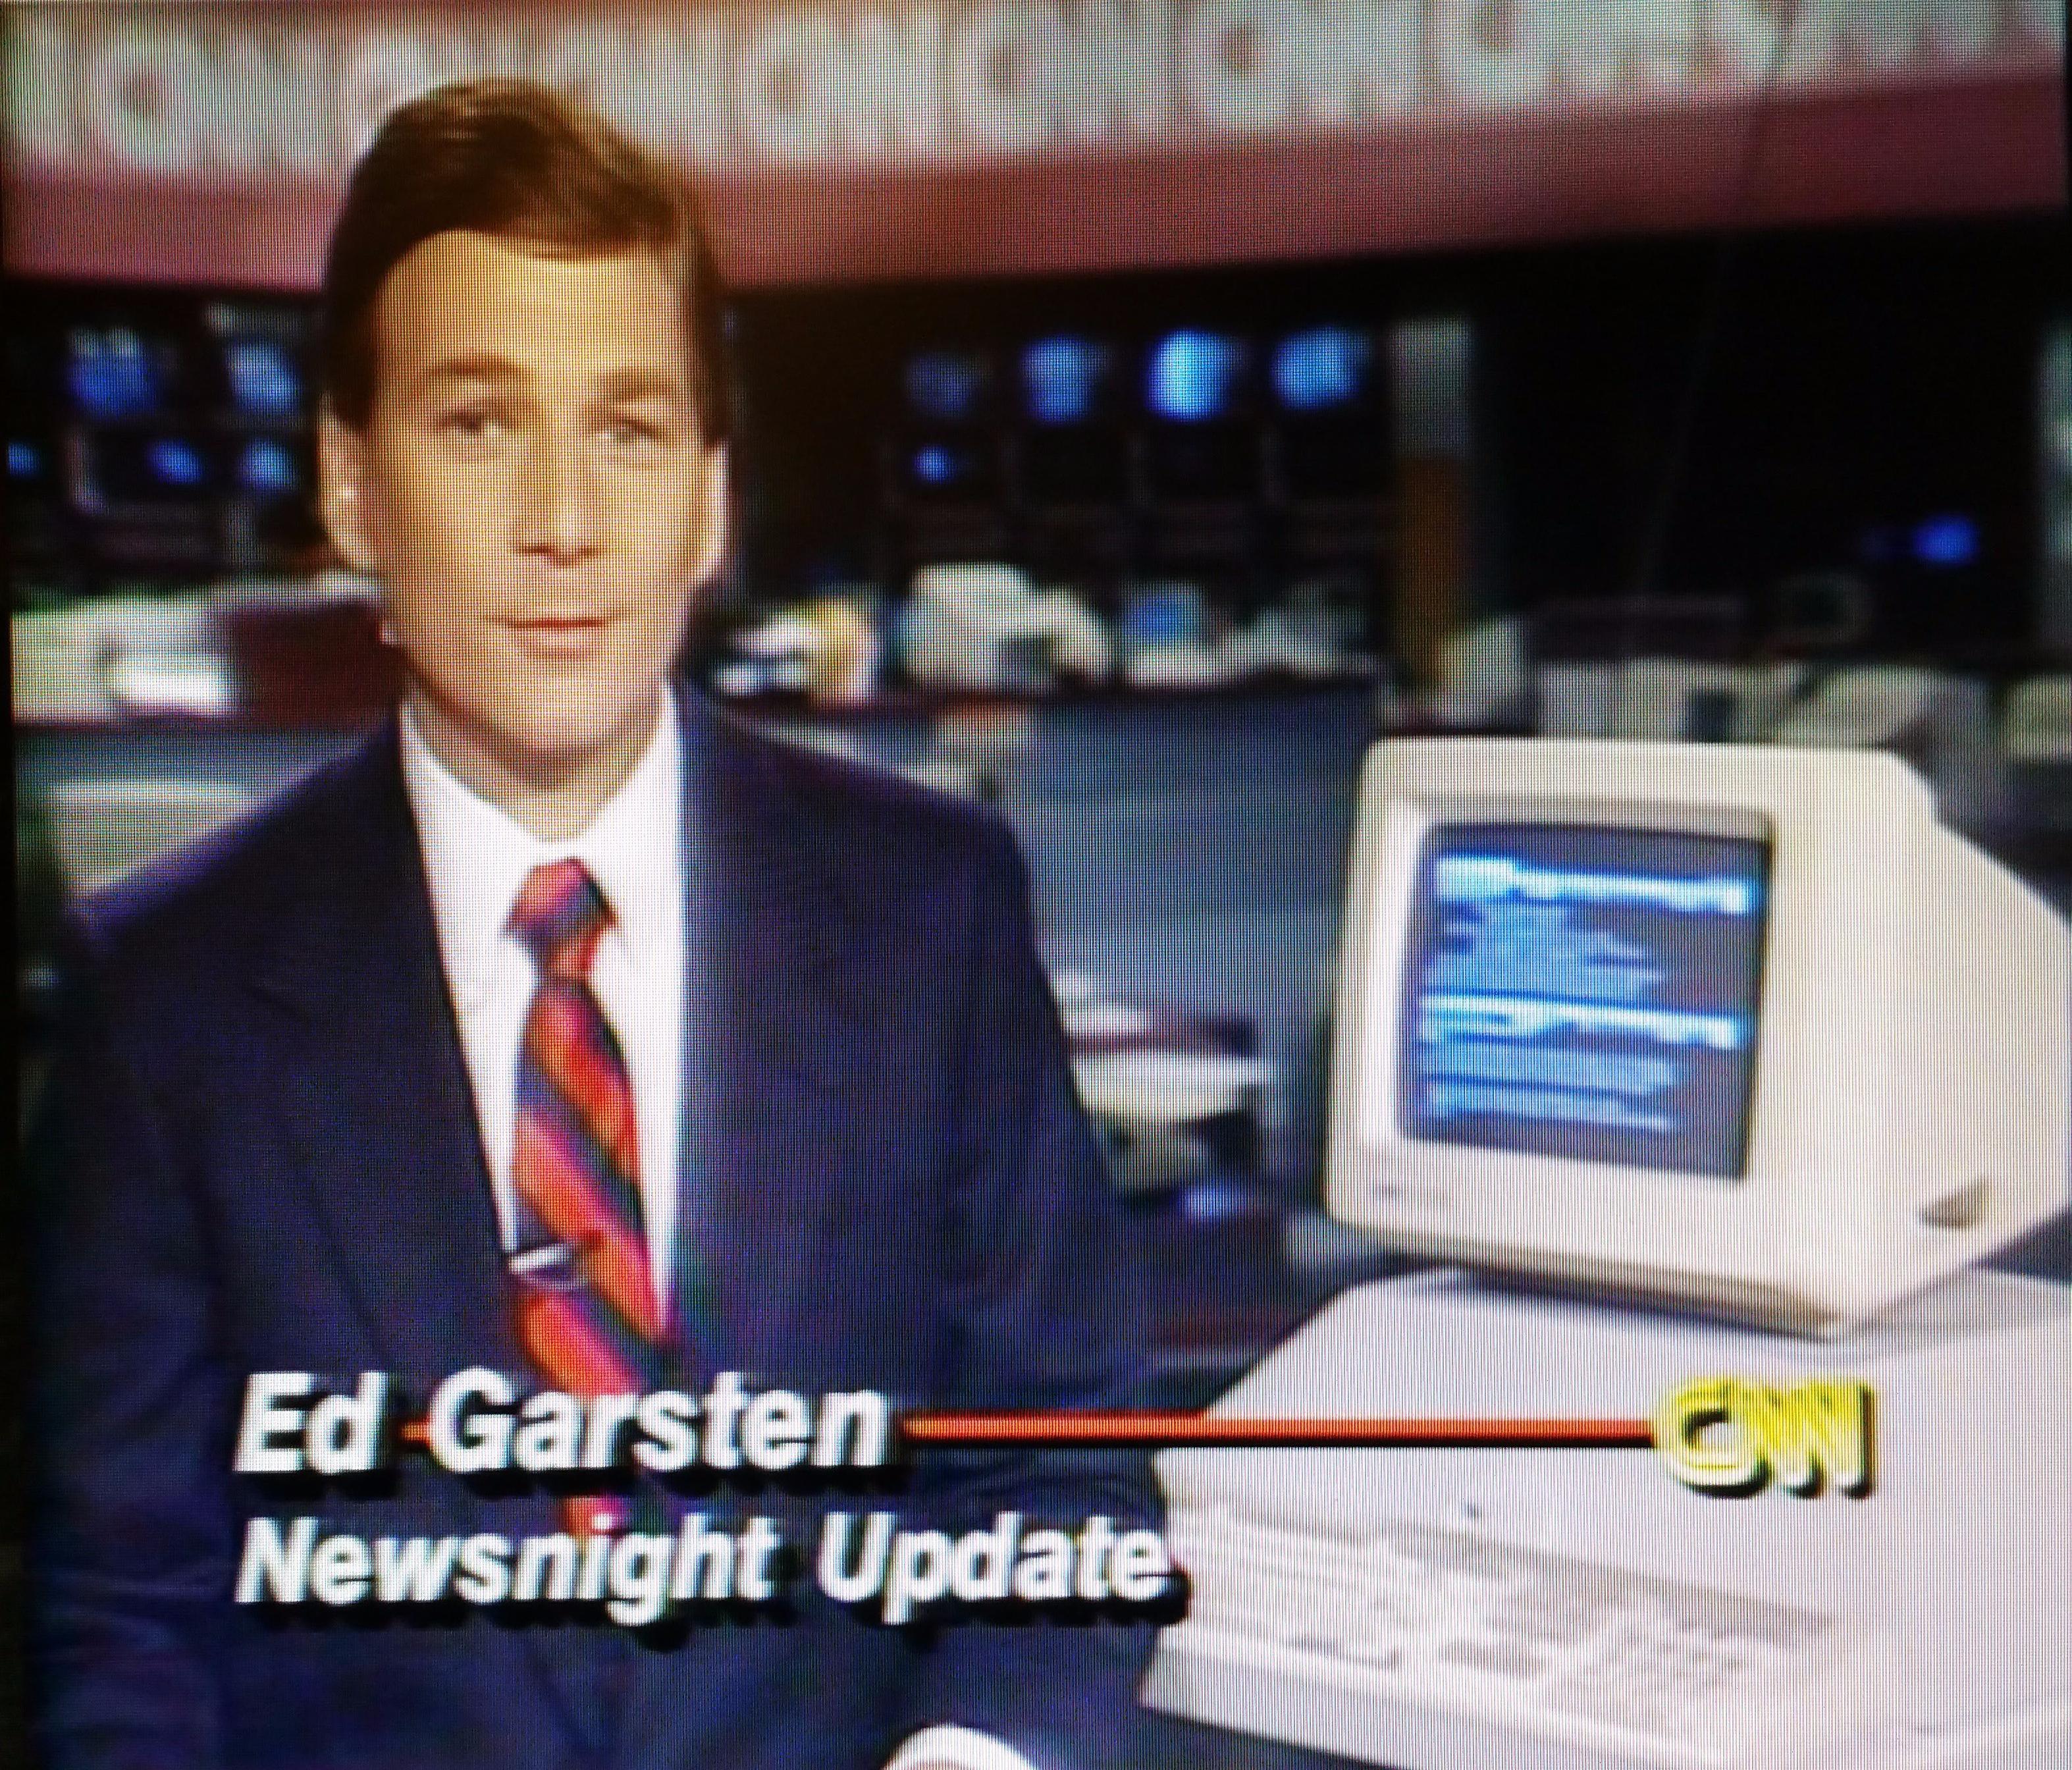 newsnight-e1491156520710.jpg